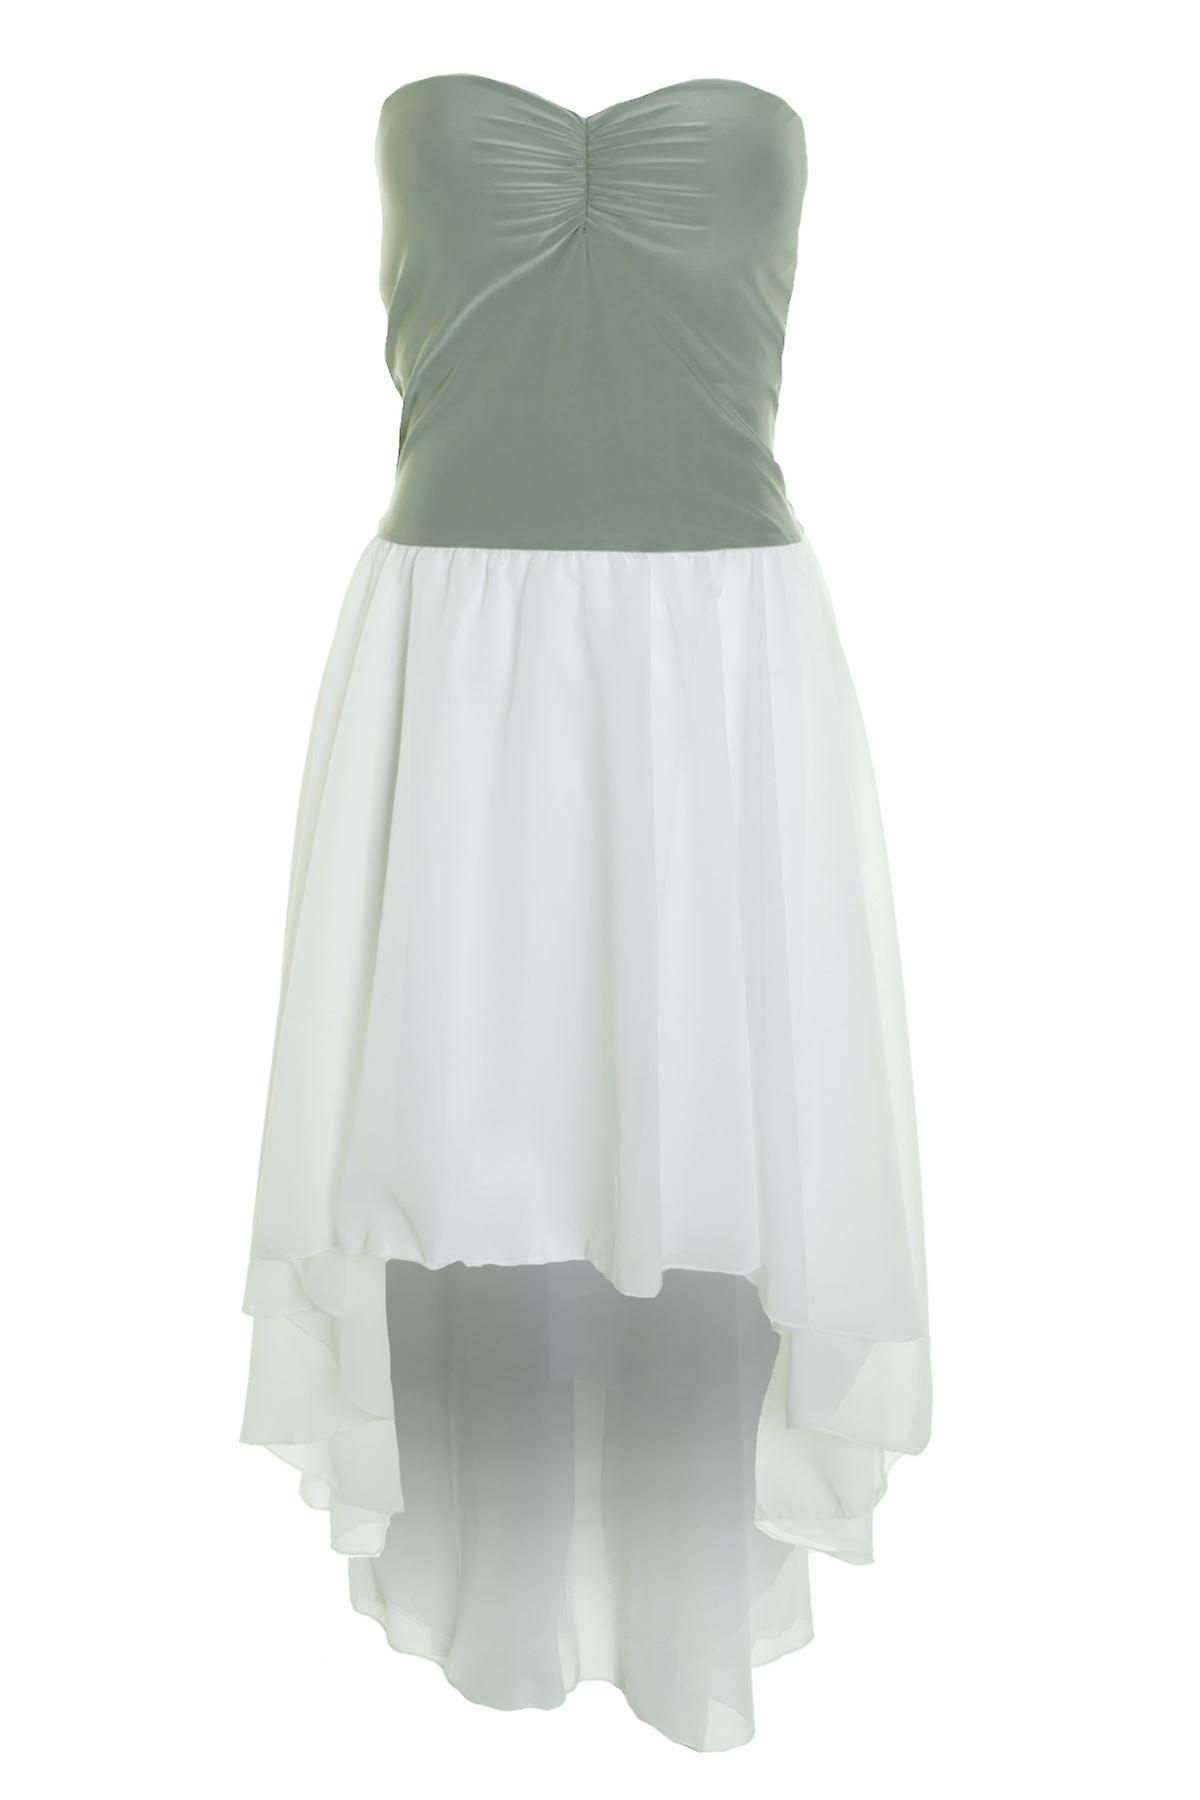 Womens Strapless Boobtube Padded Fishtail High Low Chiffon Contrast Ladies Dress